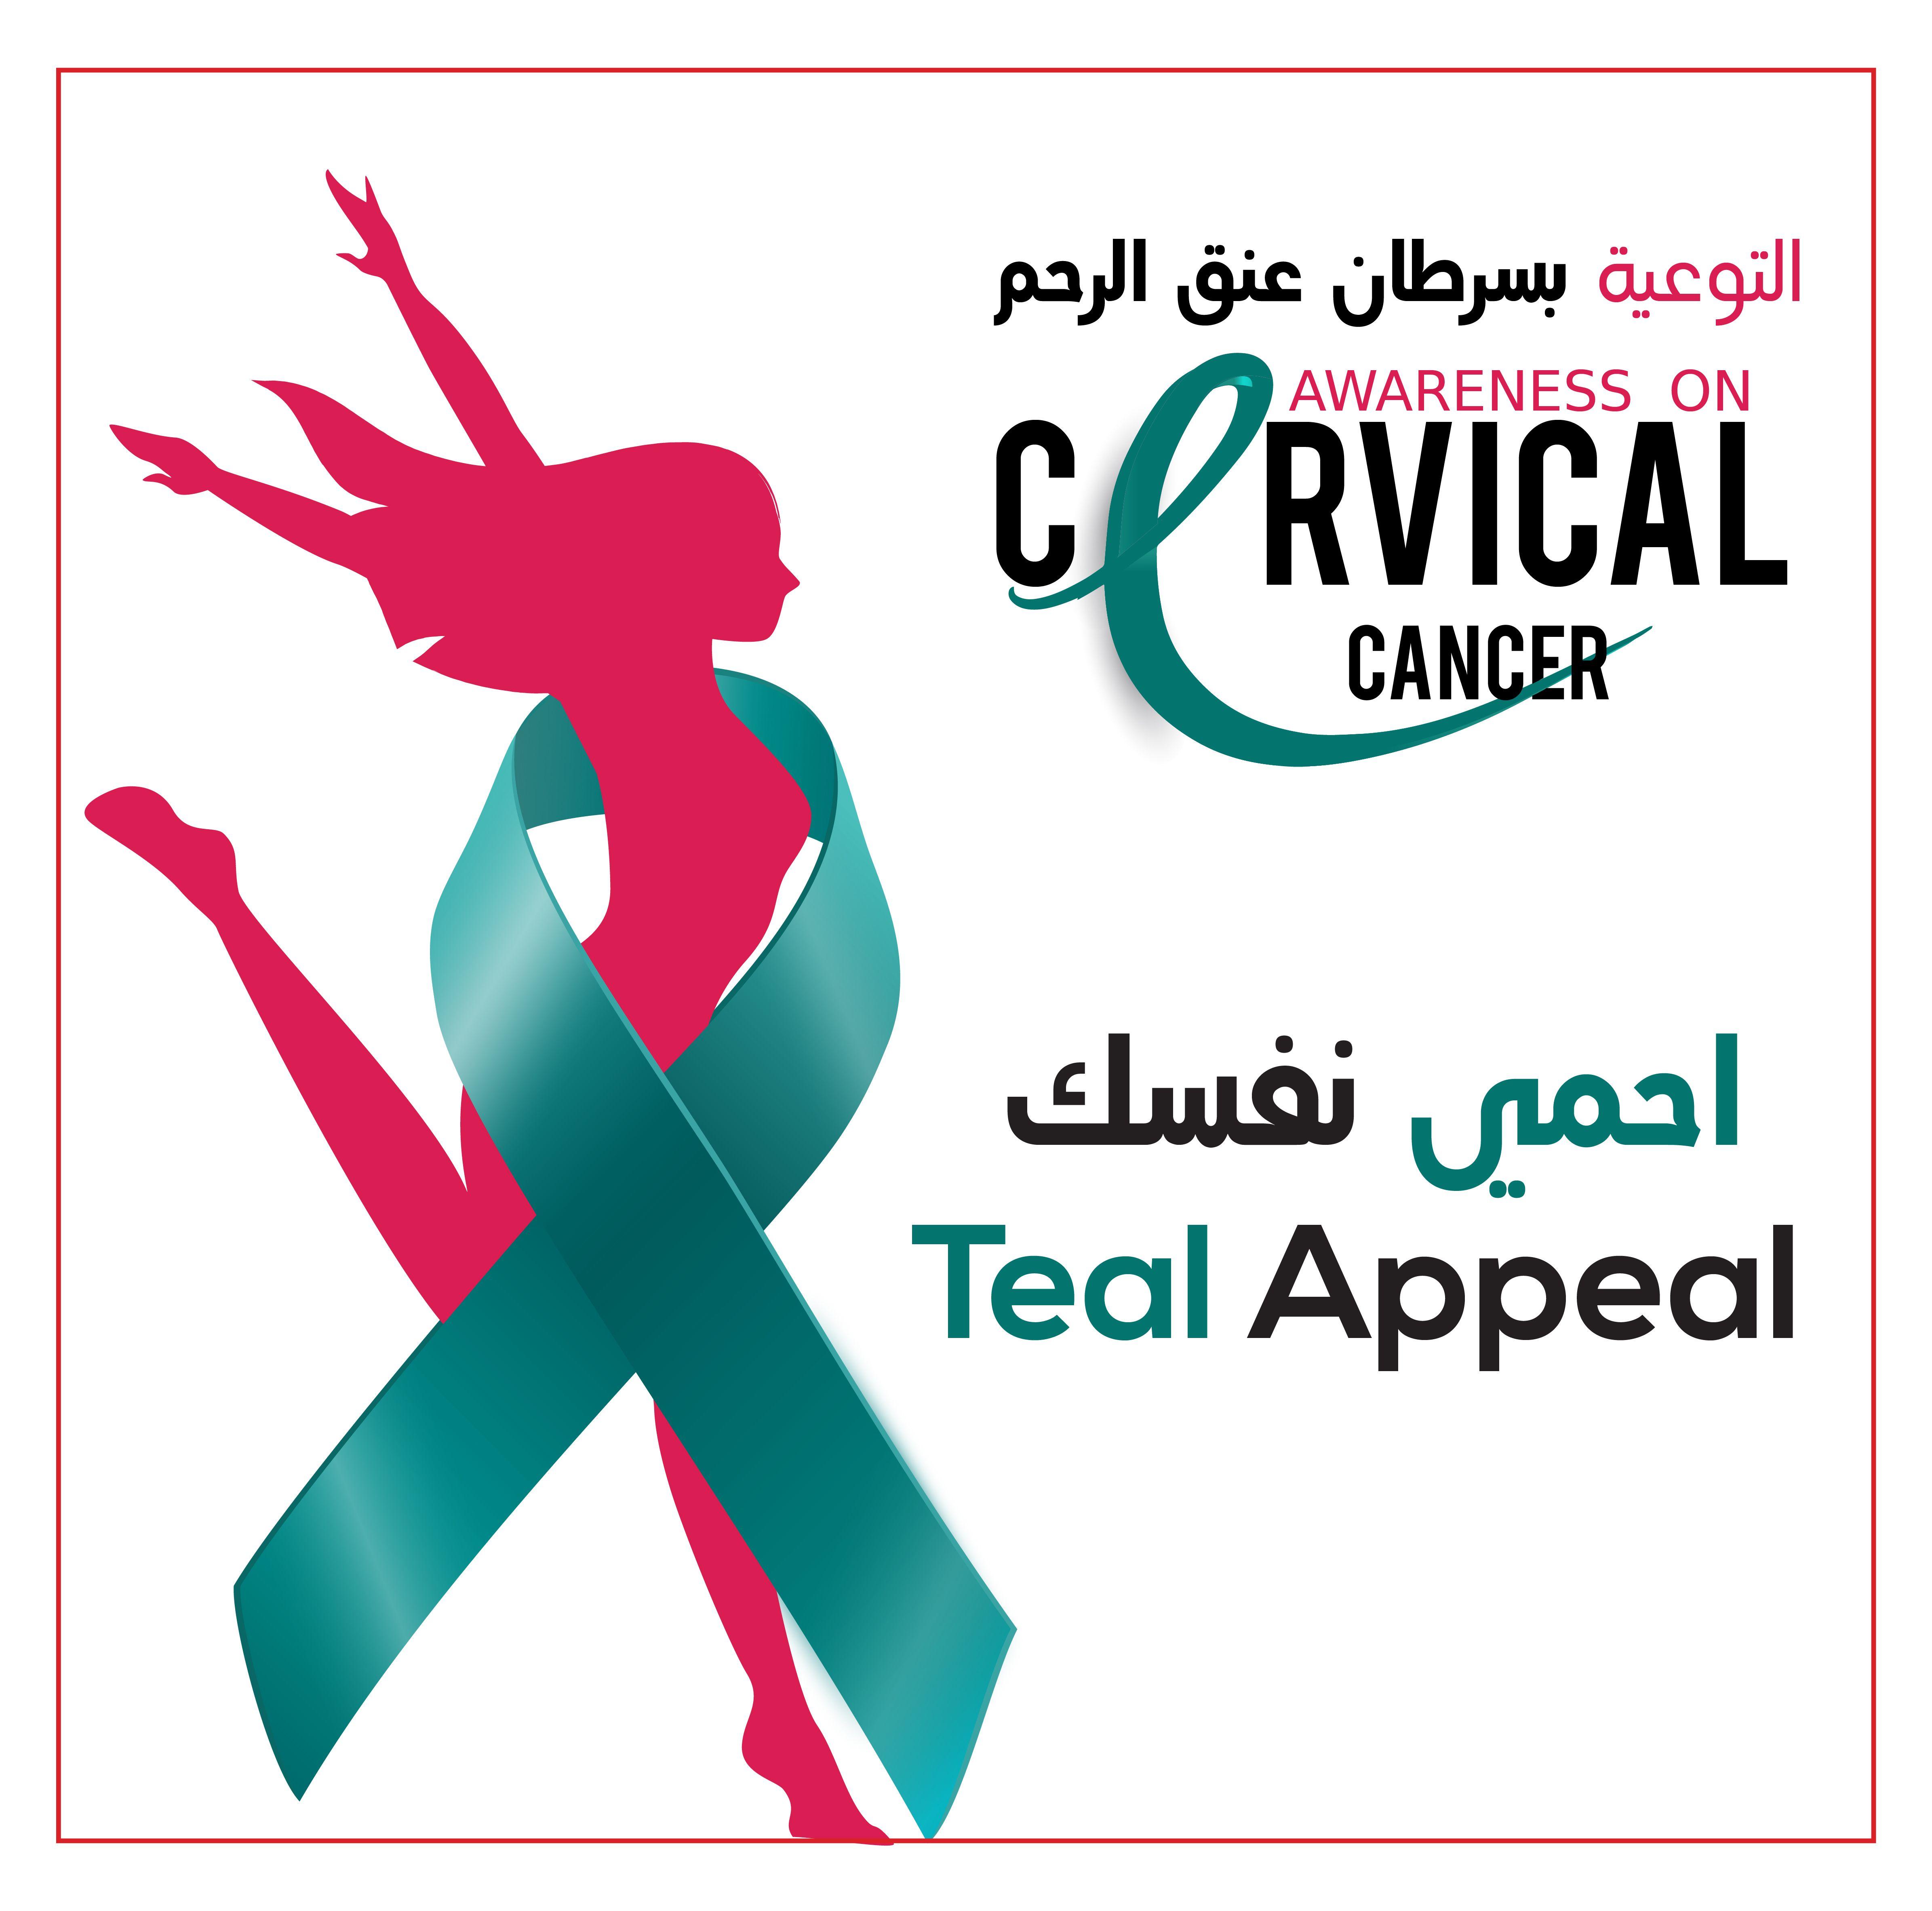 Pin On Cervical Cancer Awareness